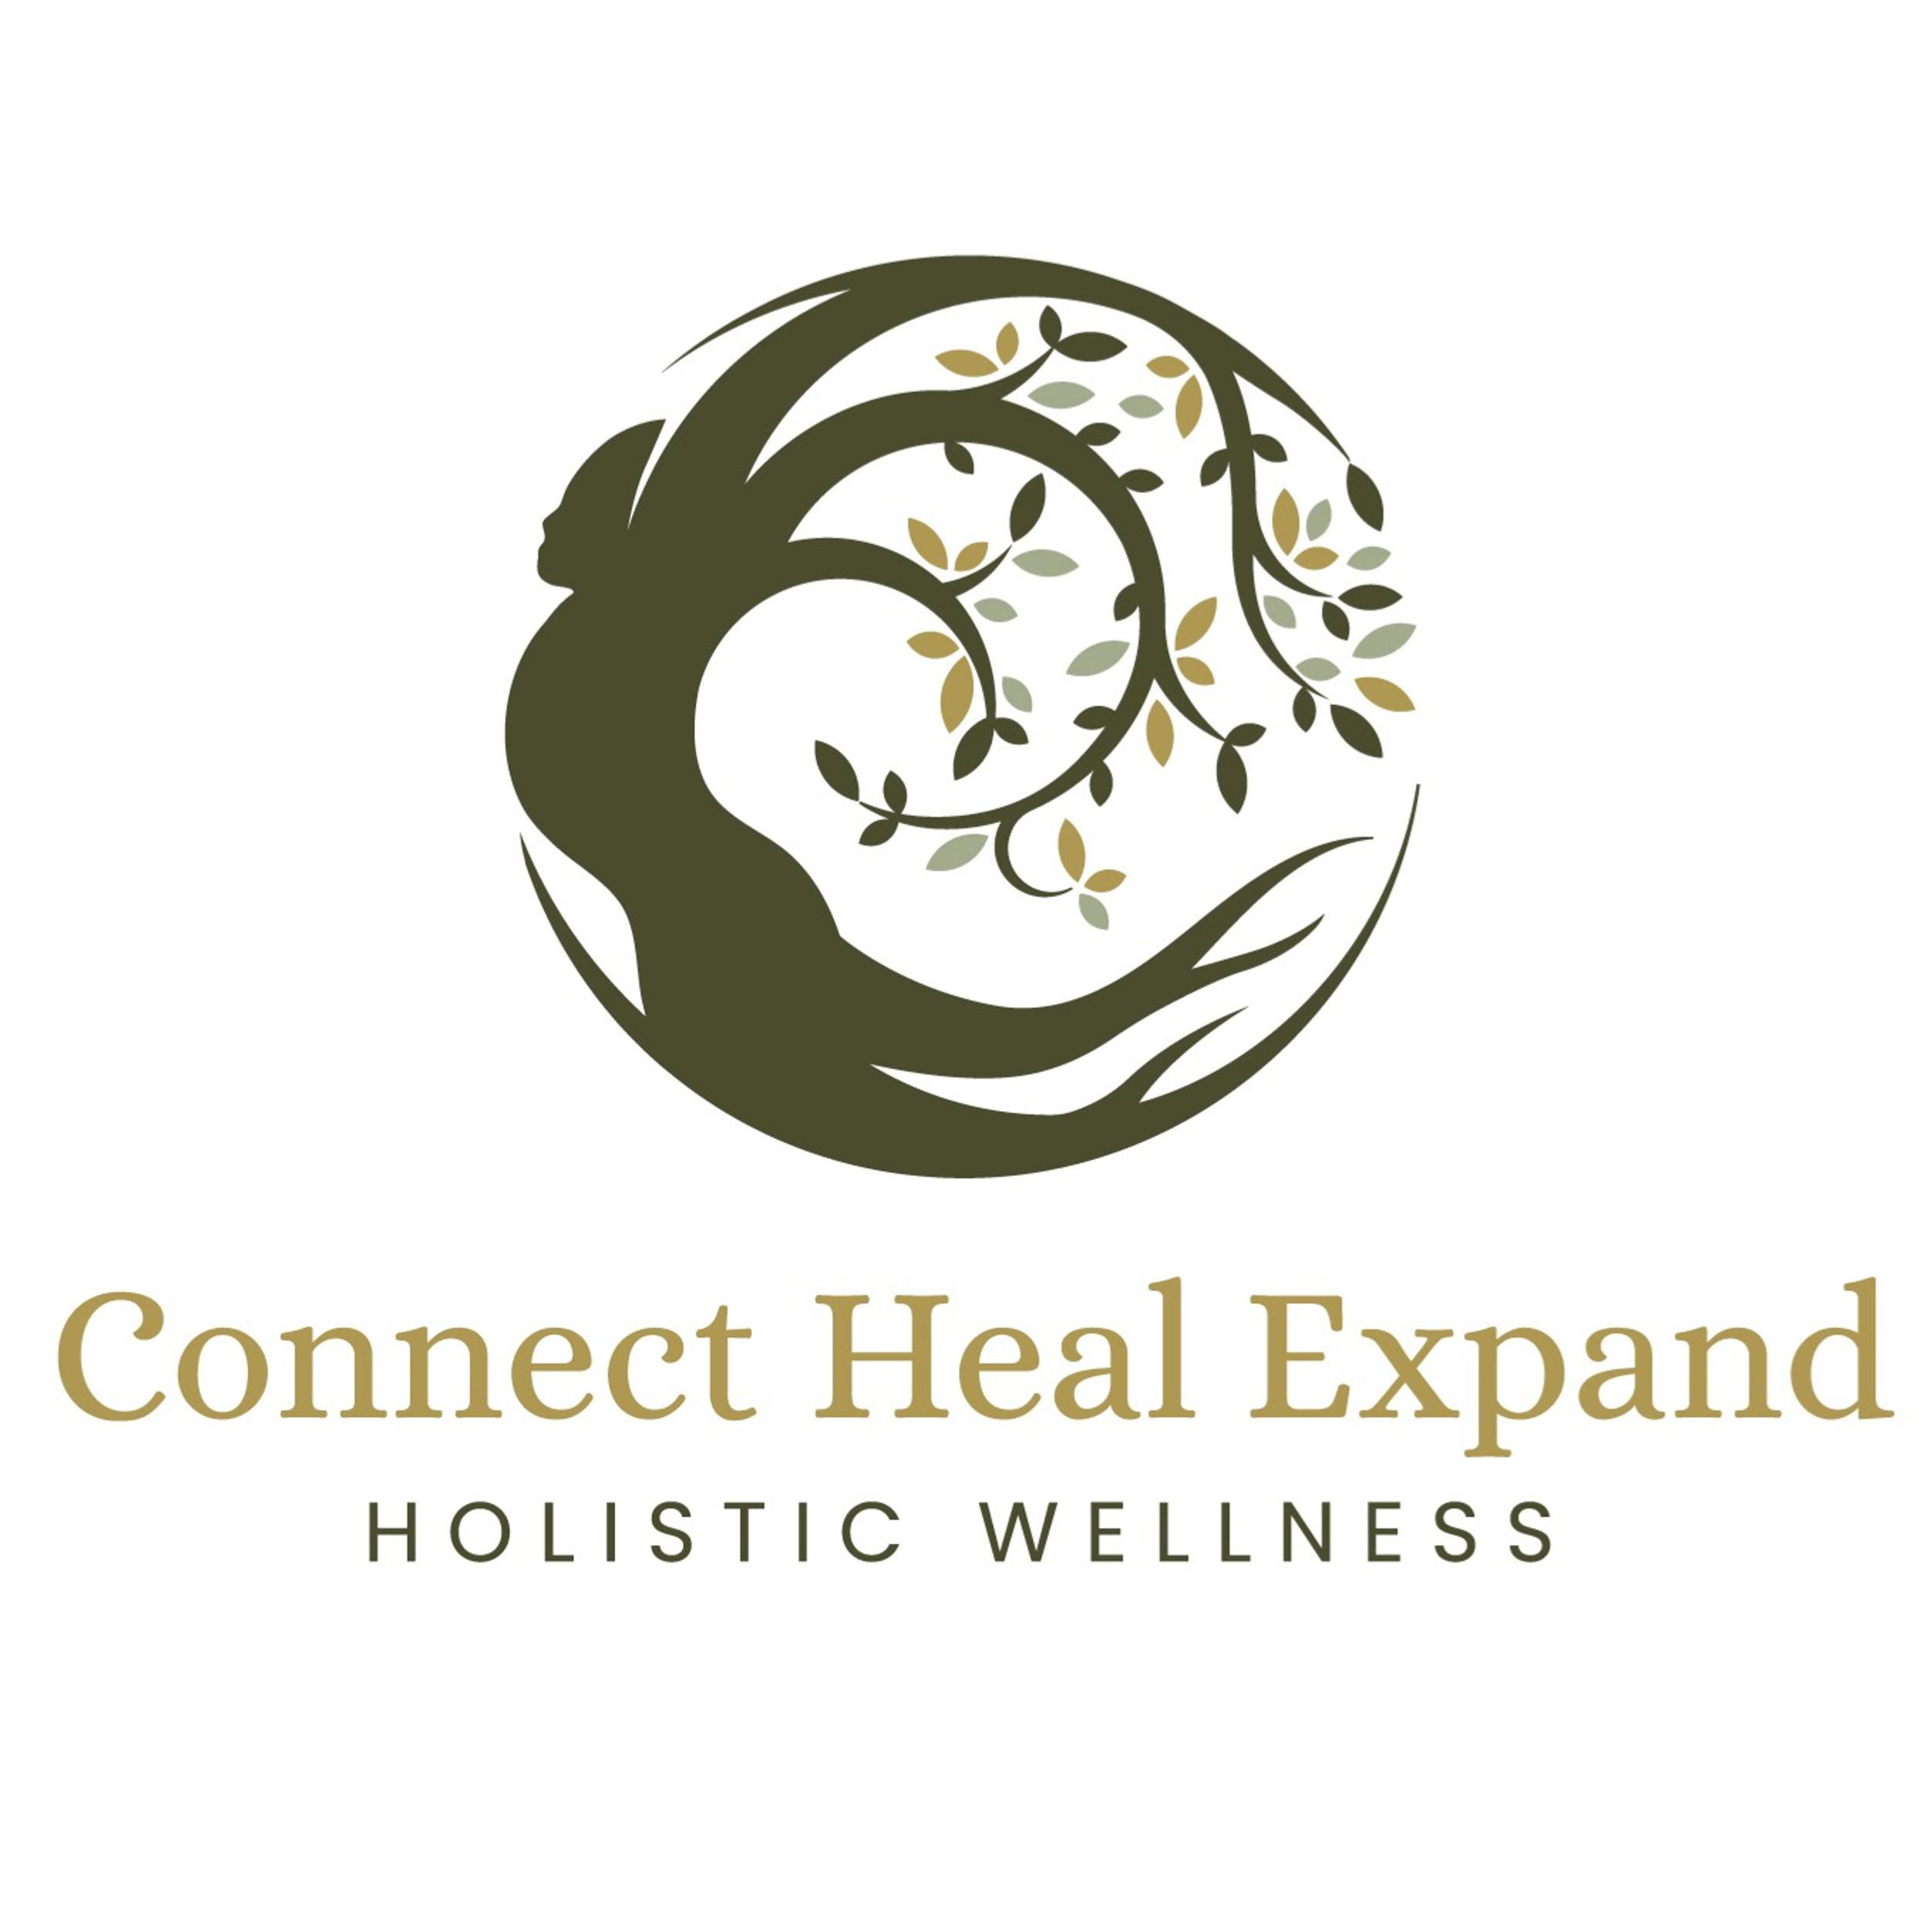 Connect Heal Expand - Holistic Wellness logo